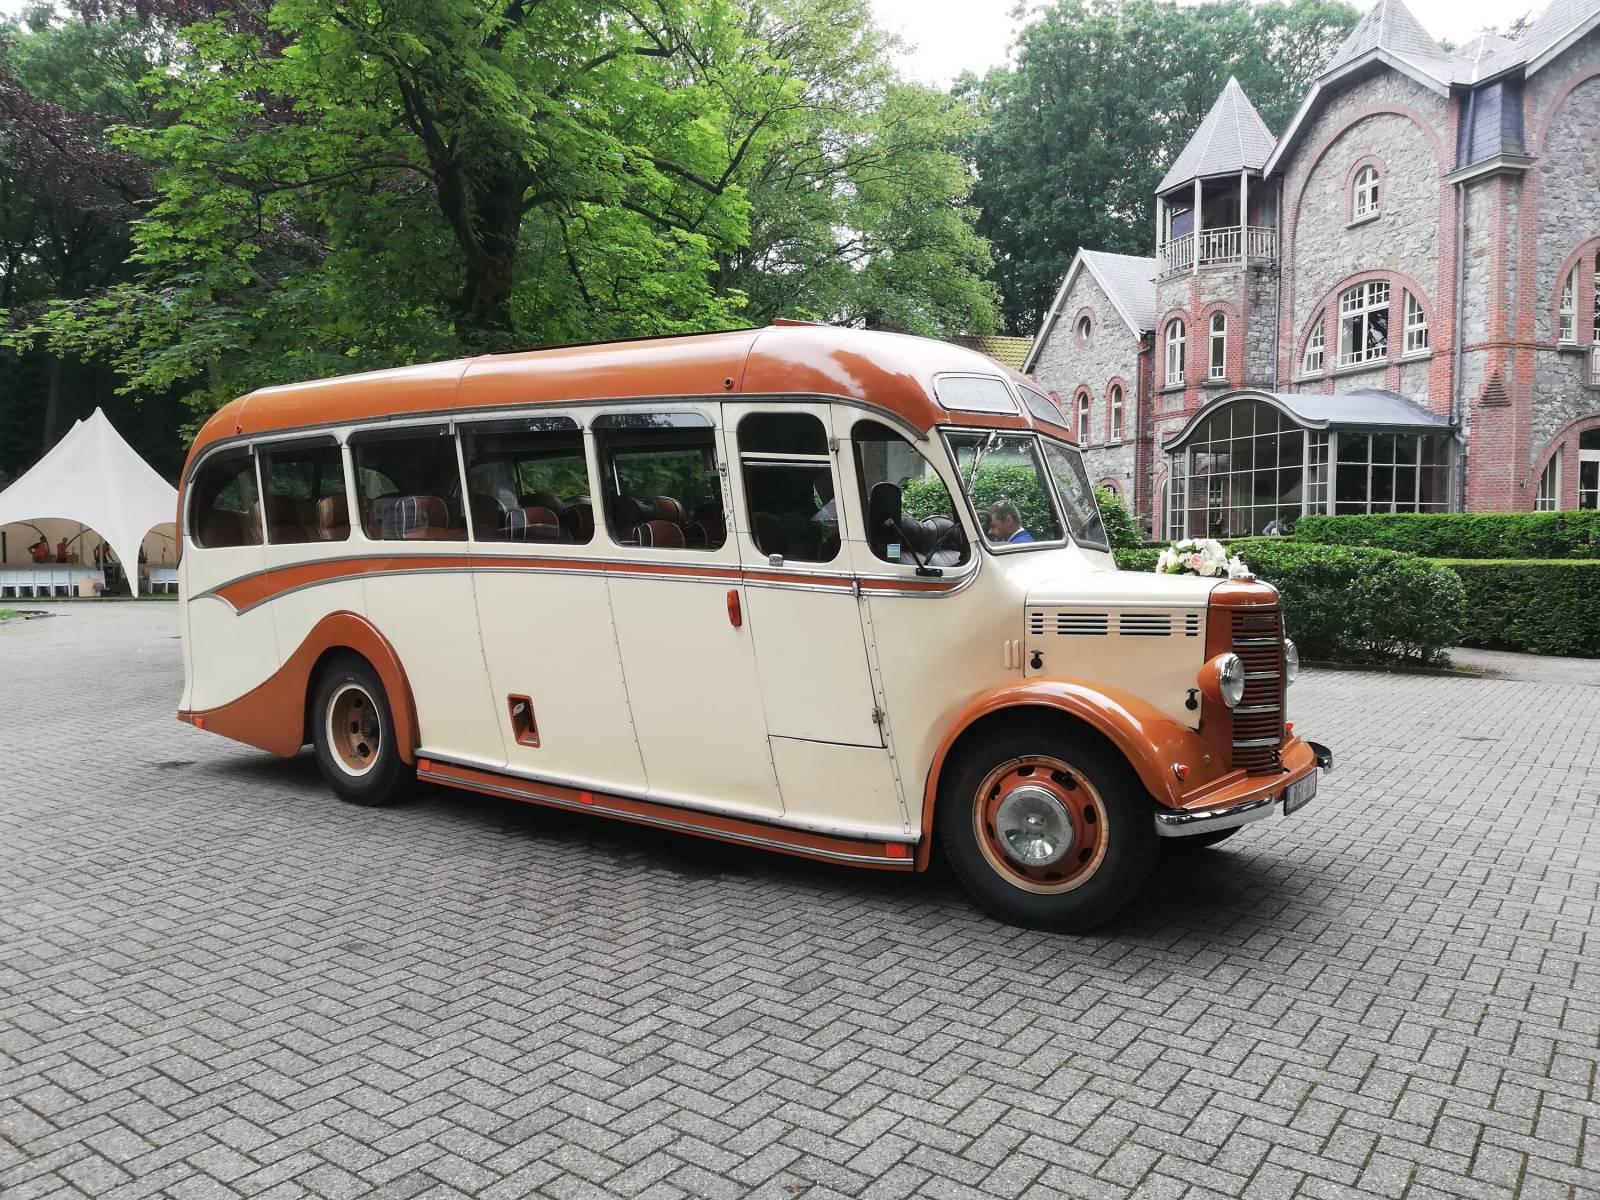 The London Ceremony Bus - Trouwvervoer - Ceremonievervoer - Bus - House of Weddings - 23